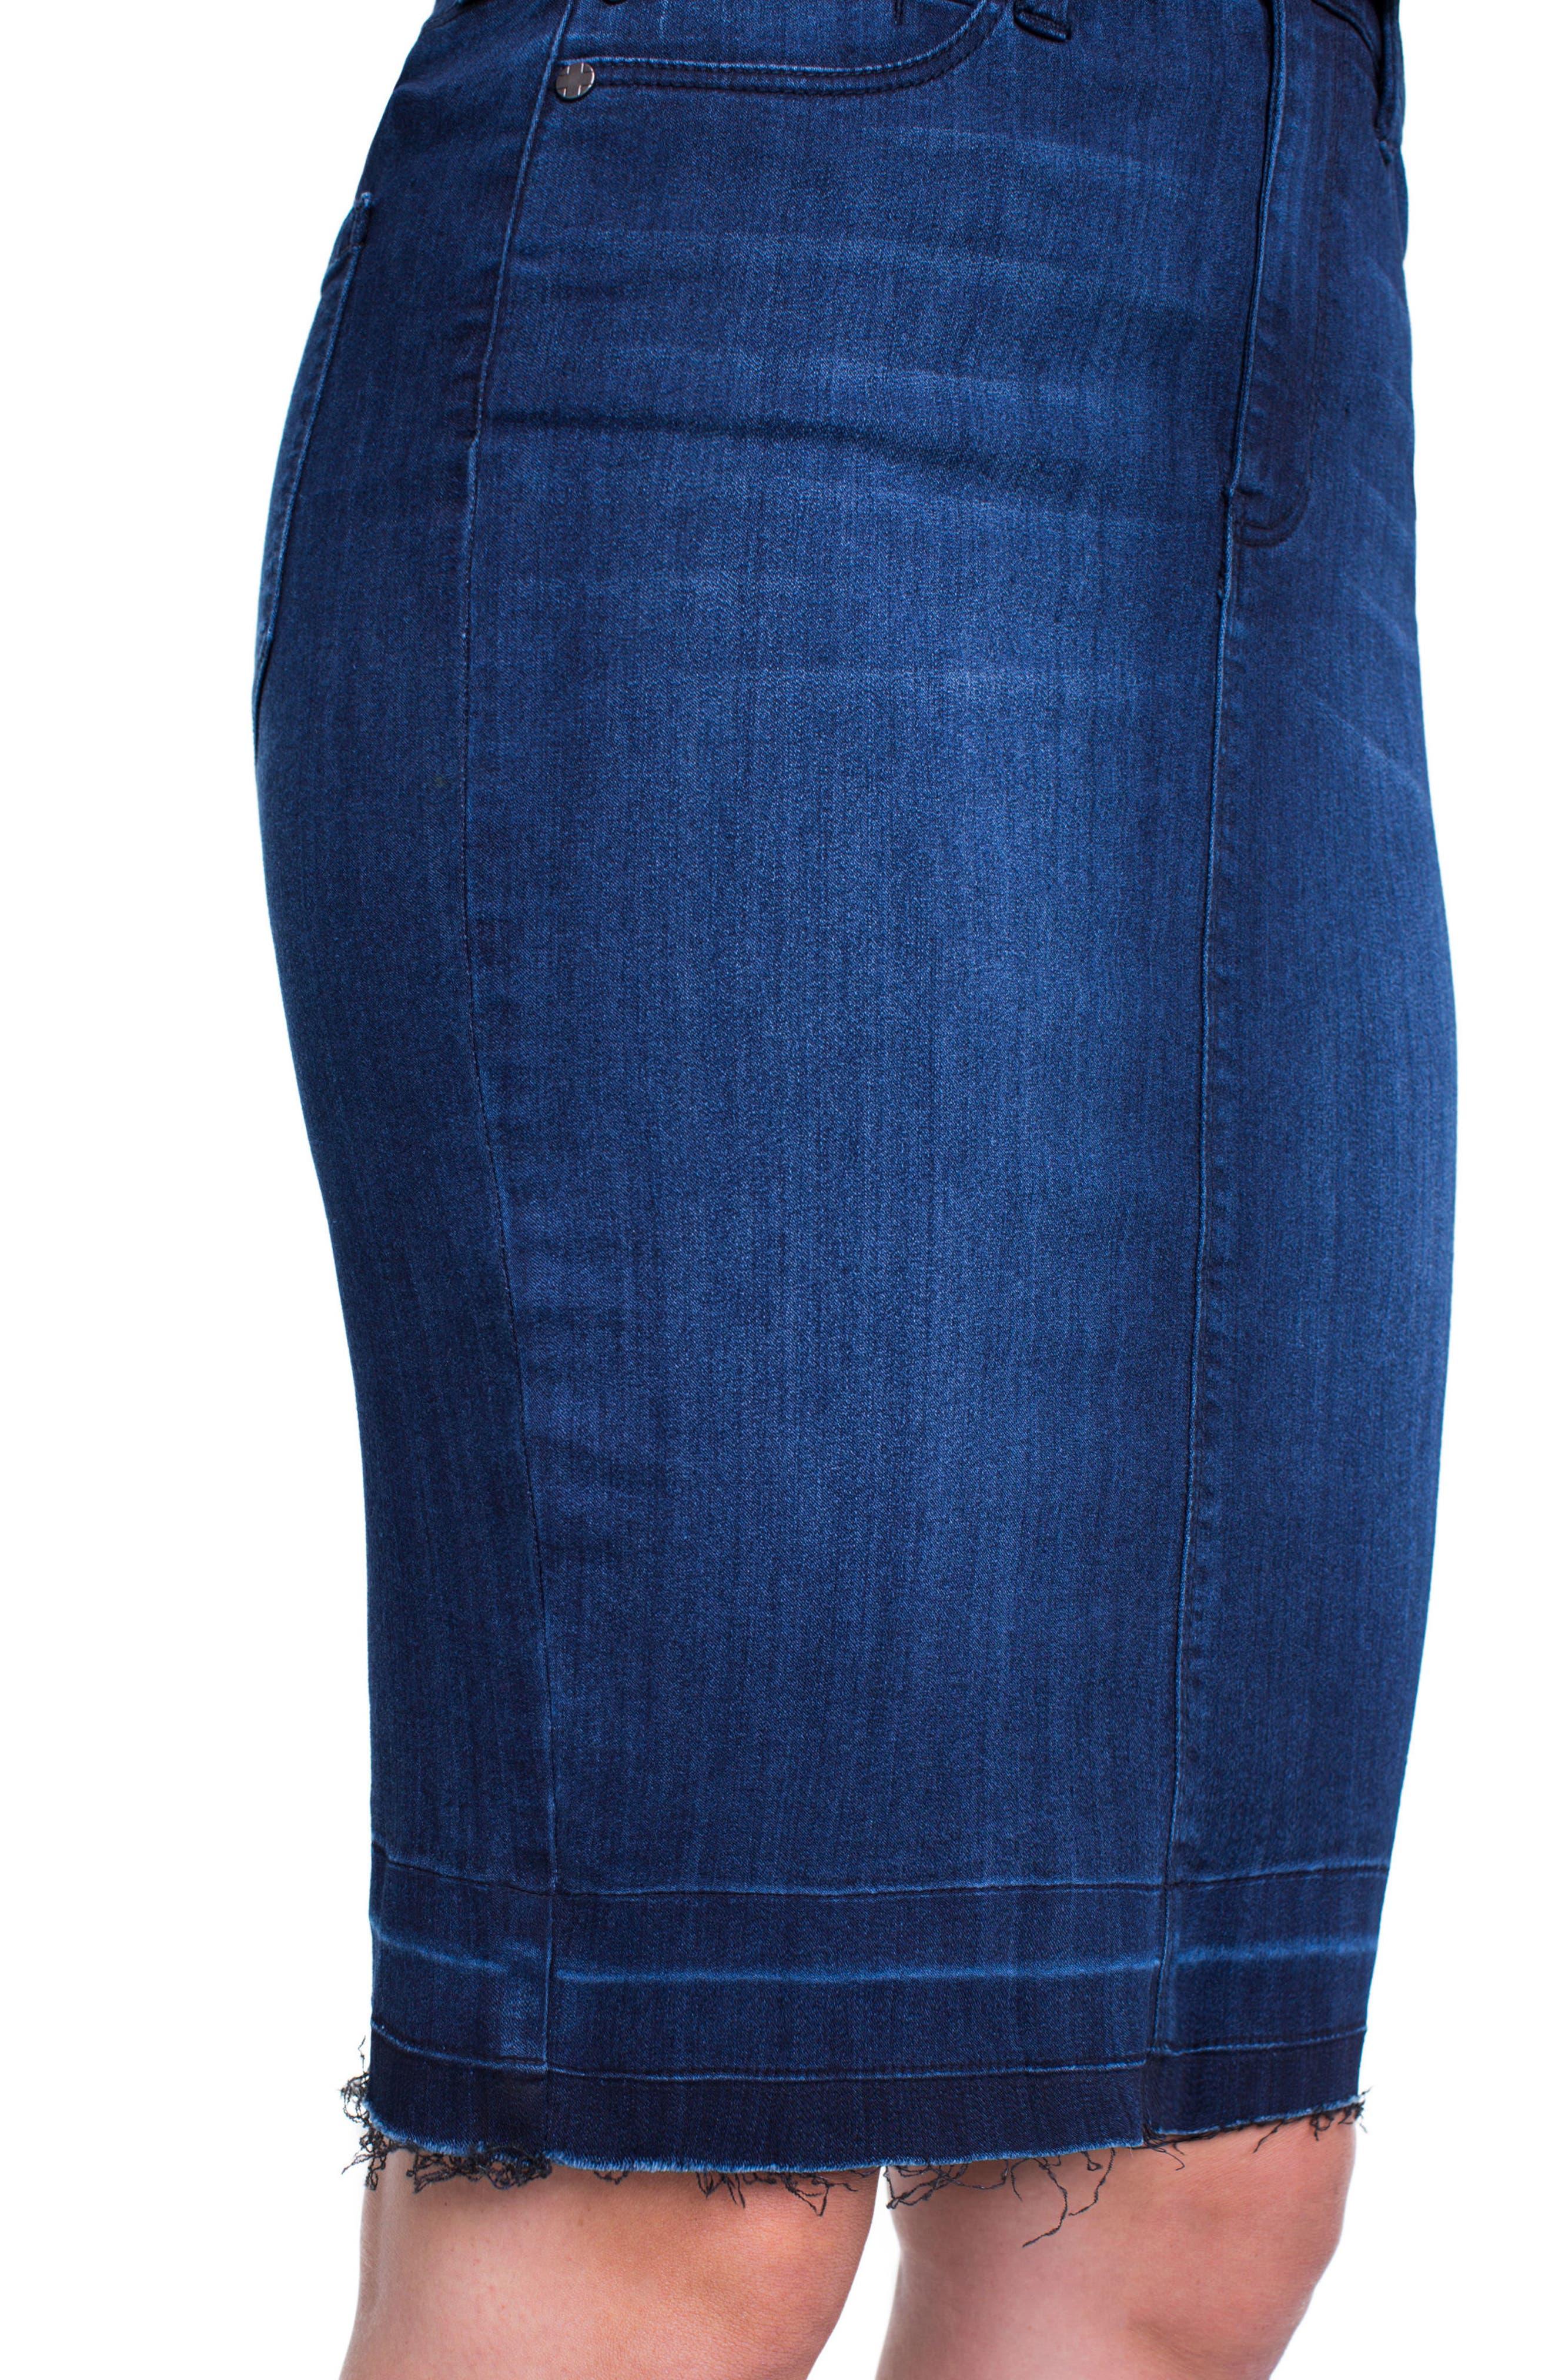 Denim Pencil Skirt,                             Alternate thumbnail 4, color,                             404